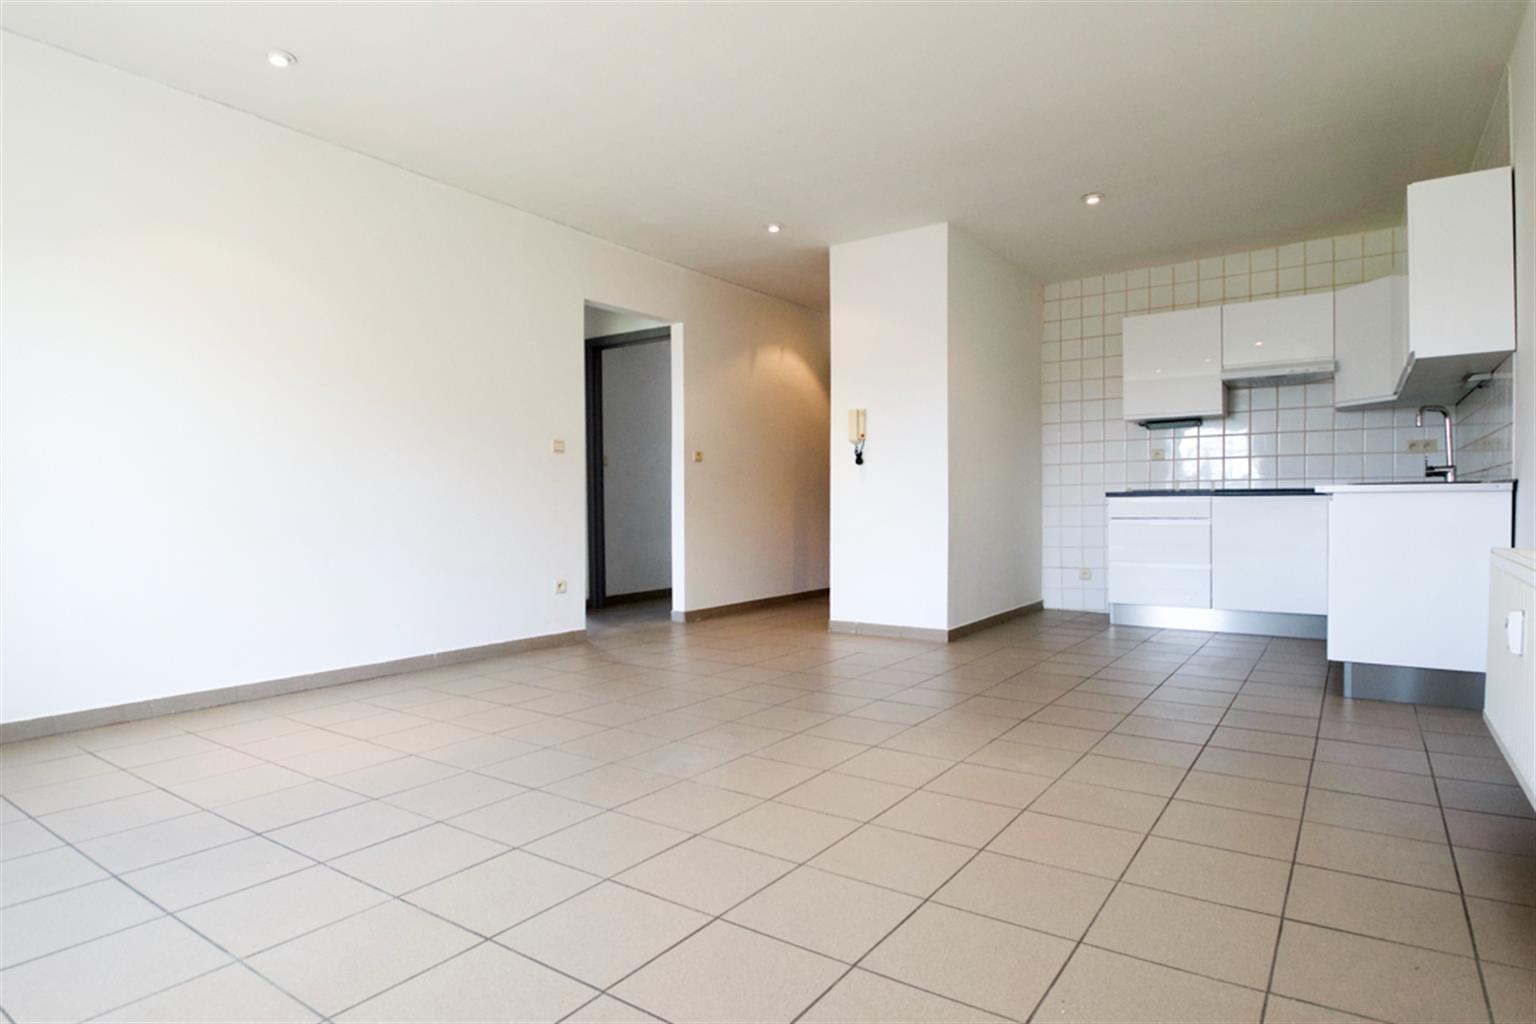 Appartement - Leval-Trahegnies - #3454438-2